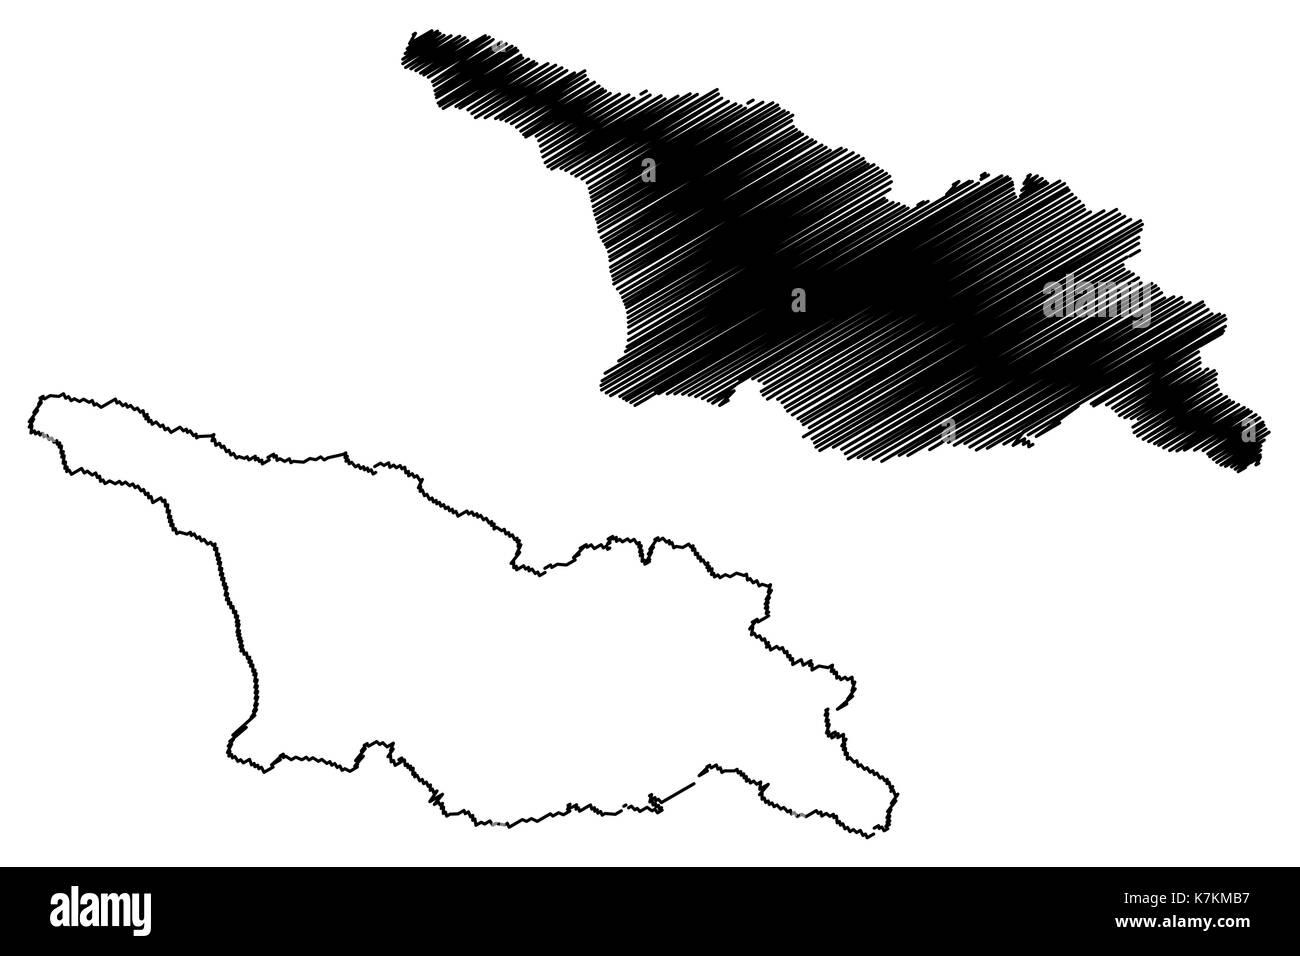 Georgia map vector illustration, scribble sketch Georgian - Stock Image